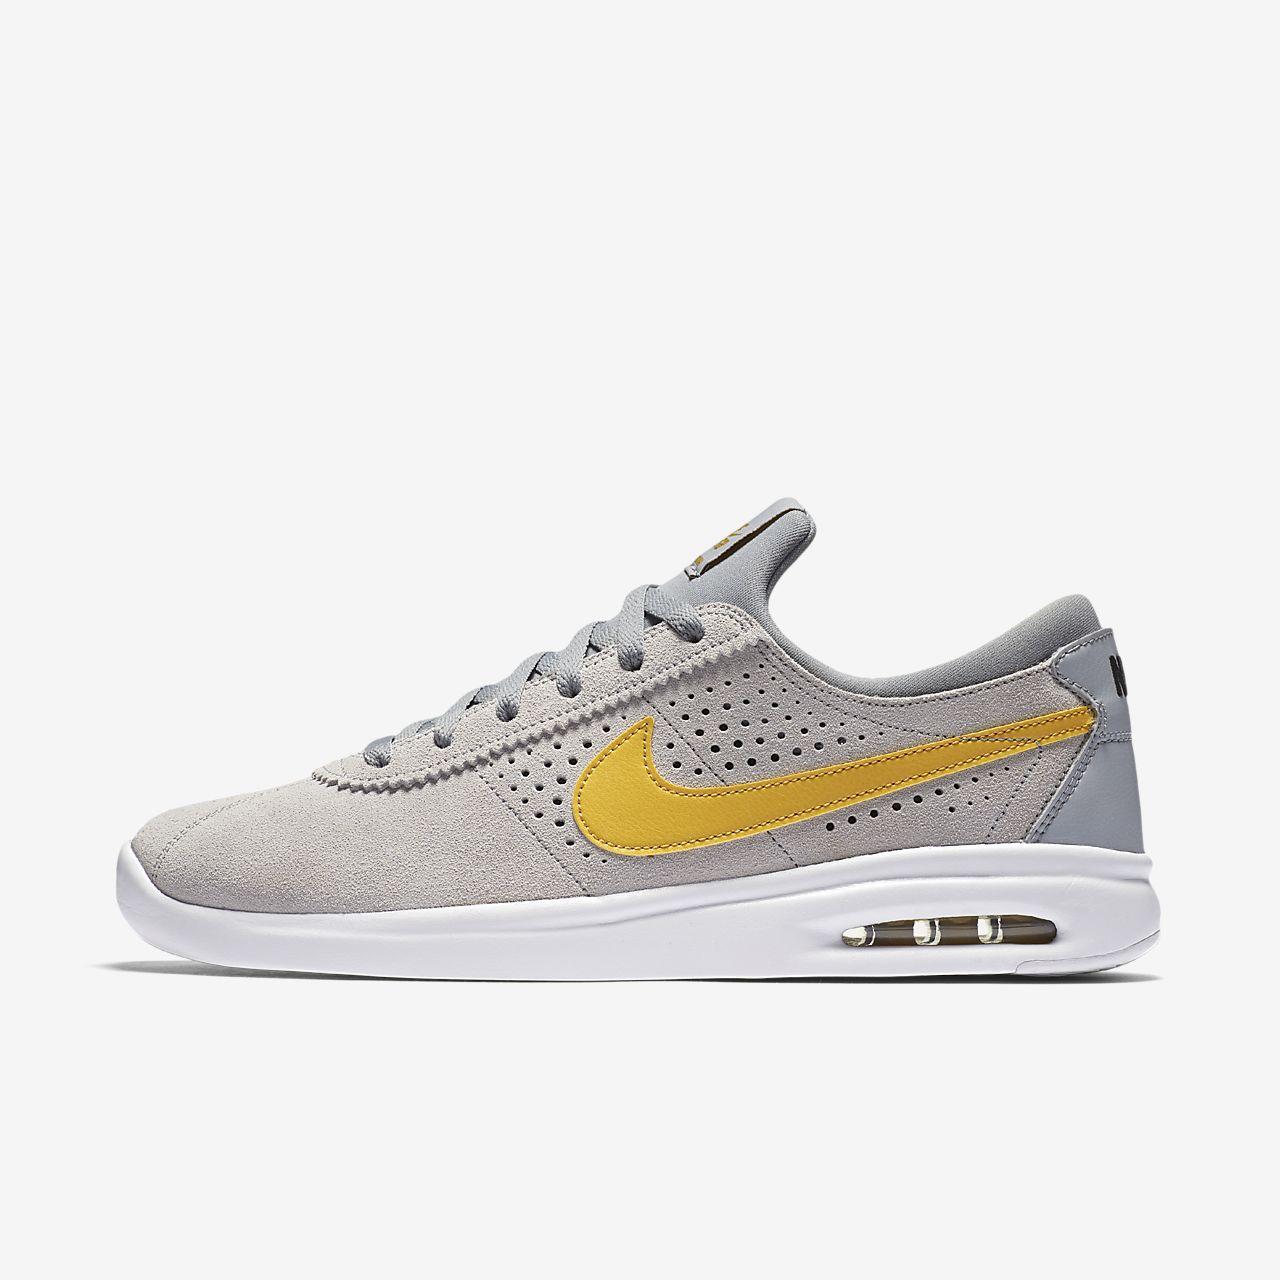 ... Nike SB Air Max Bruin Vapor Men\u0027s Skateboarding Shoe